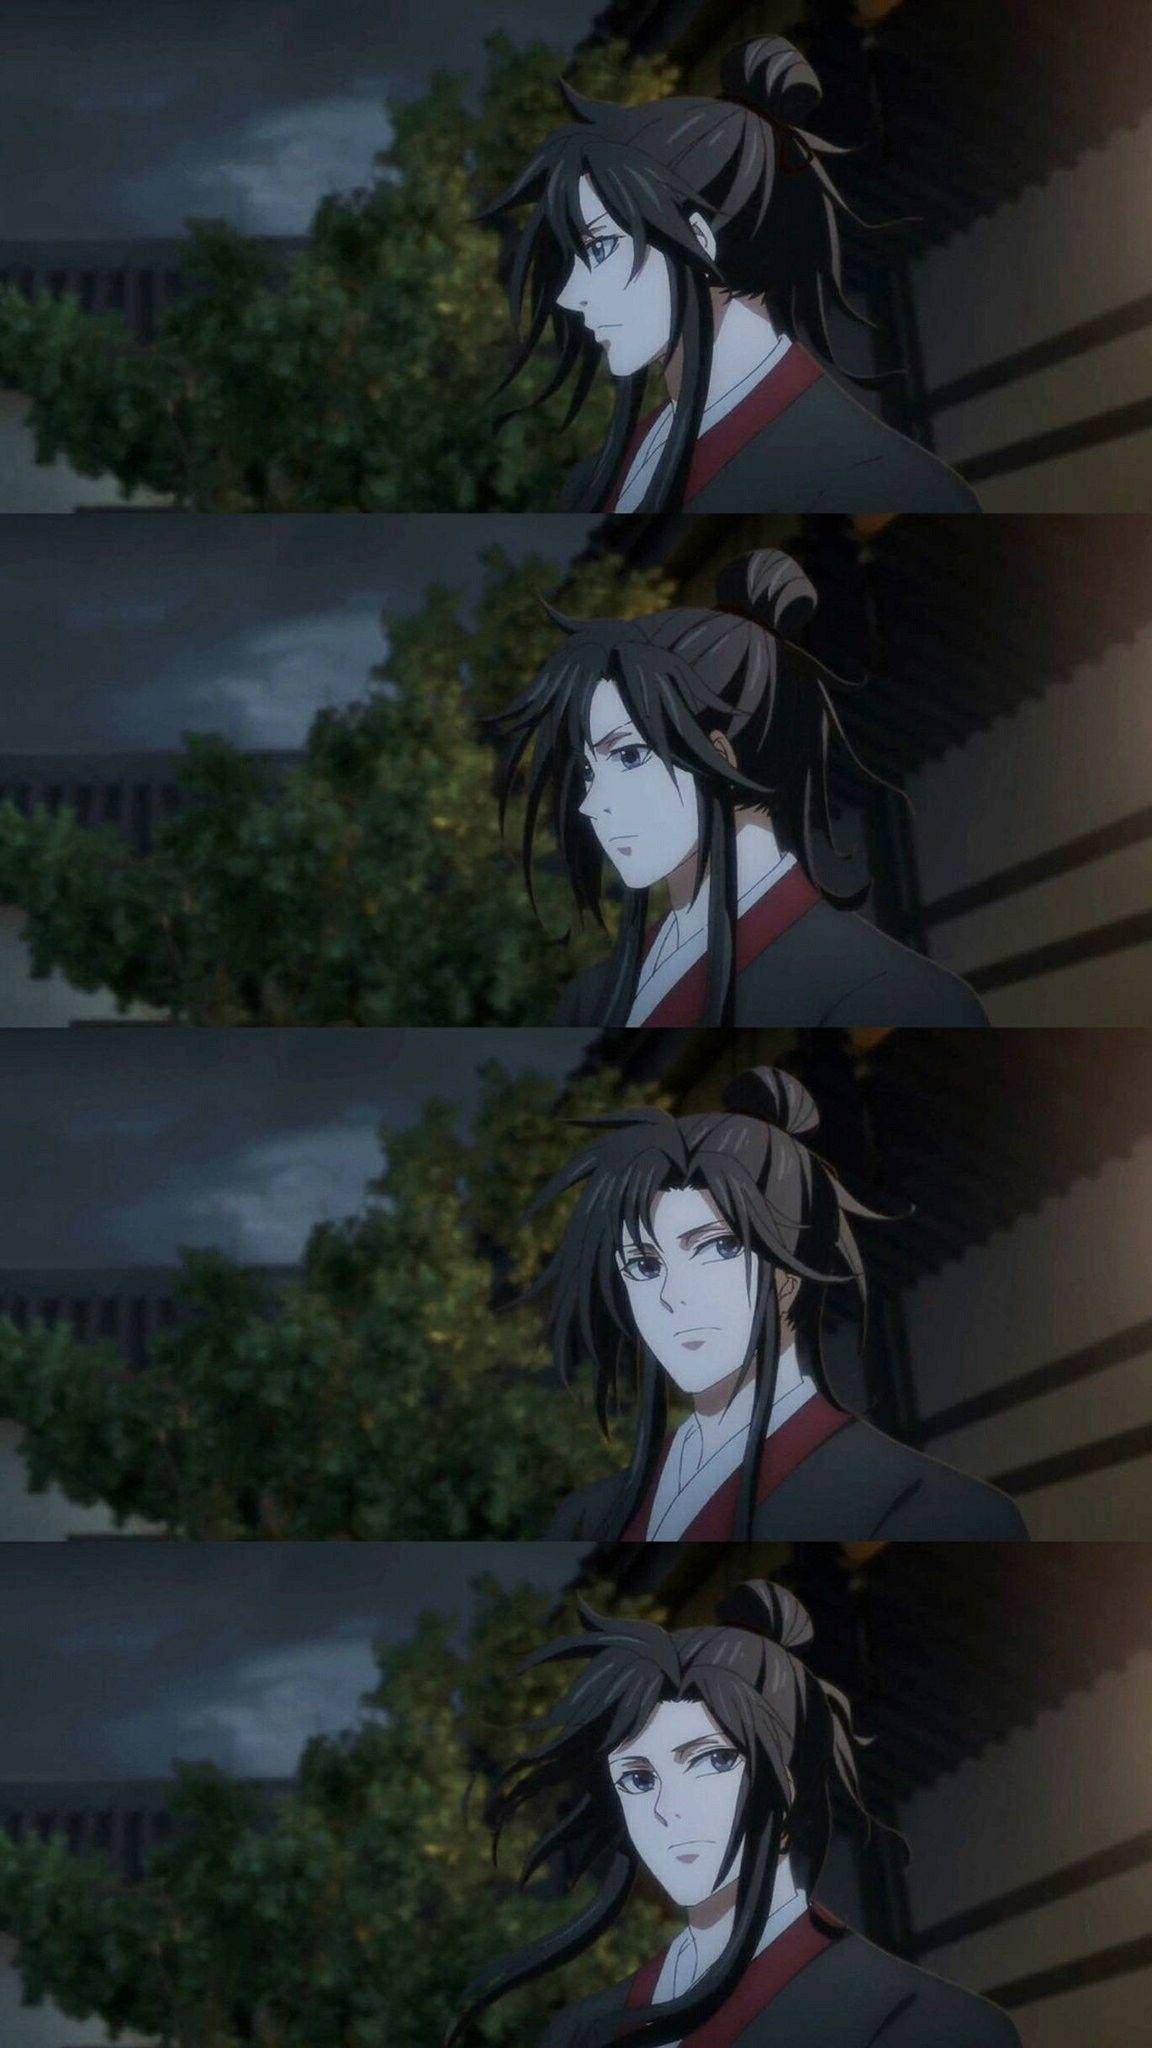 Pin by The Spiritual Otaku on 魔道祖师 Me me me anime, Anime